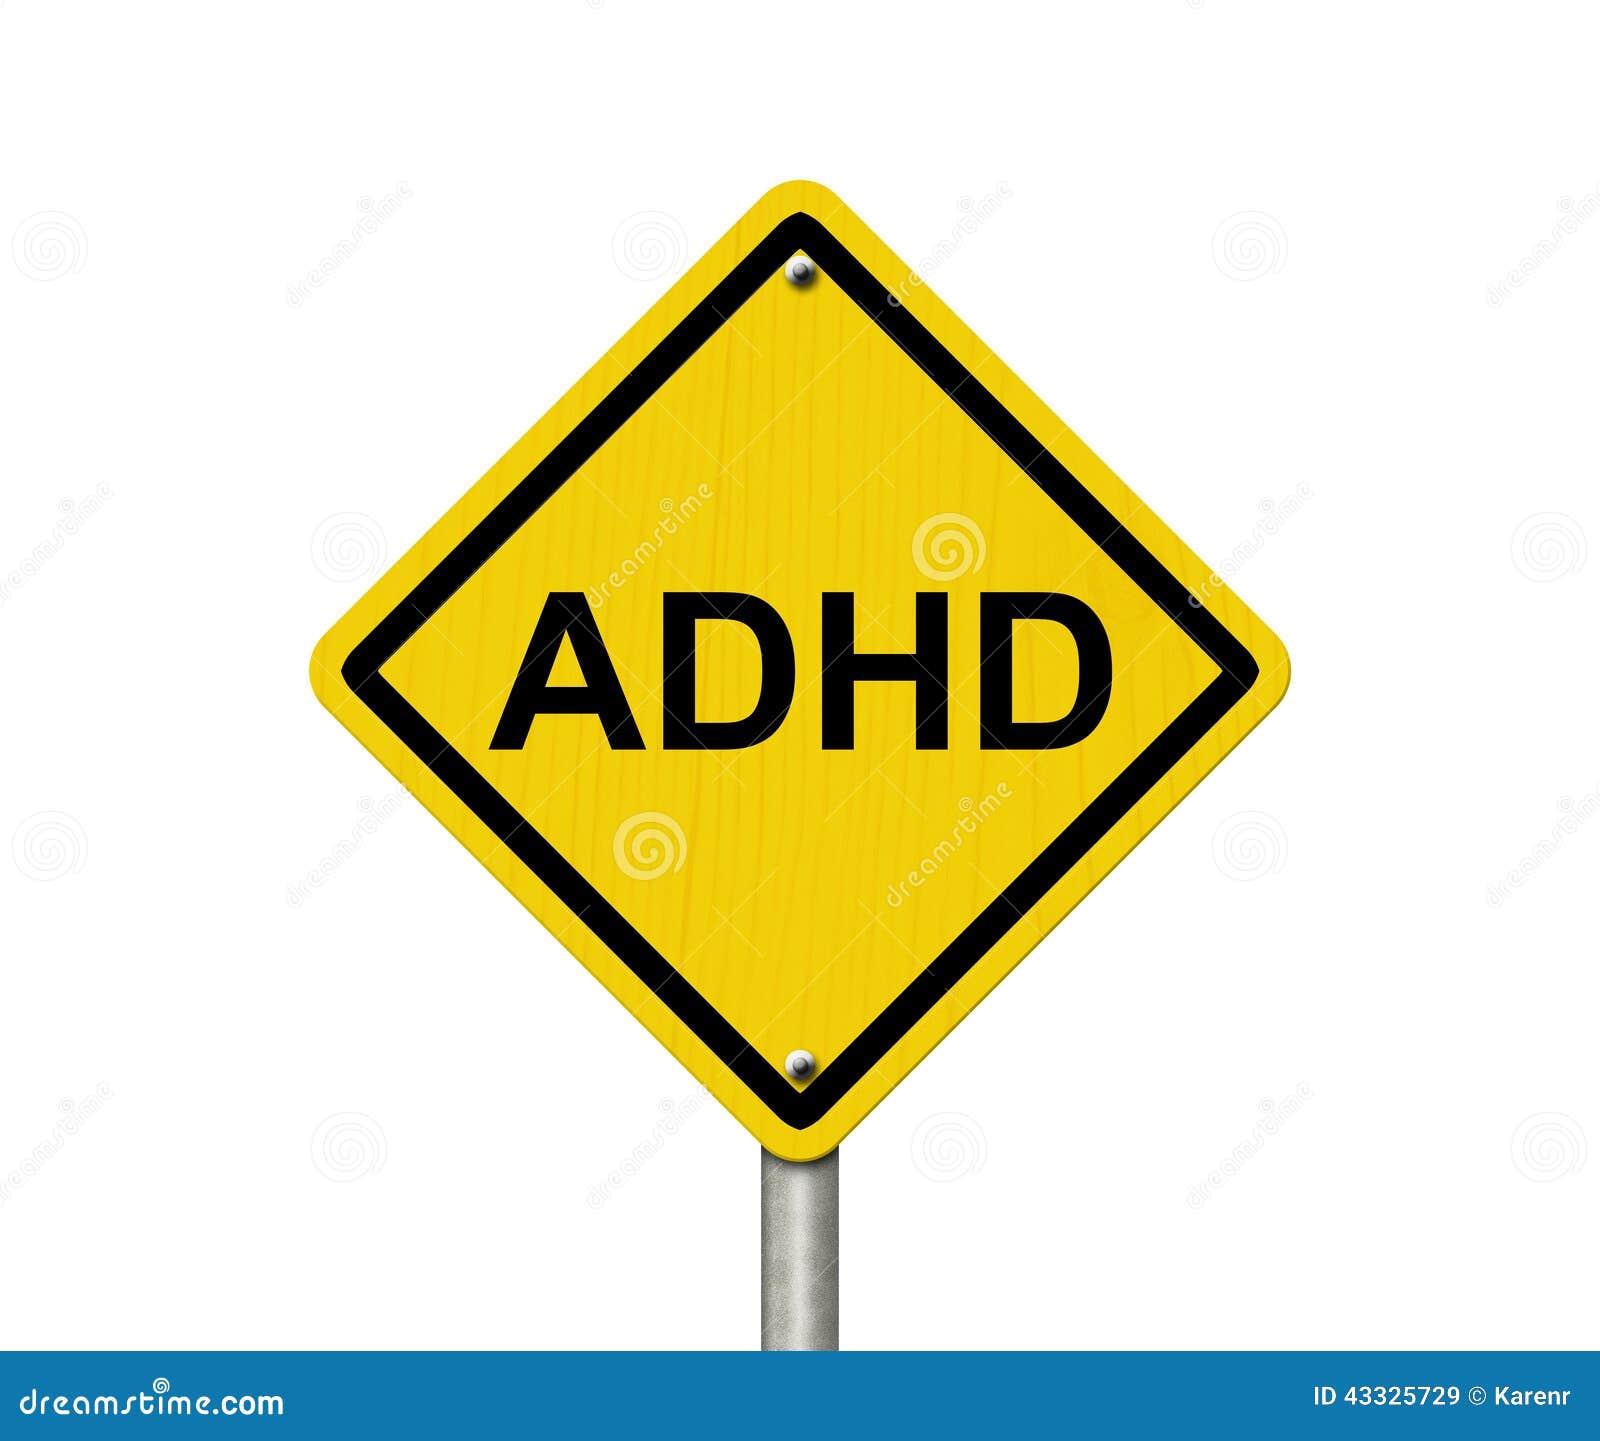 Warning Signs Of ADHD Stock Photo - Image: 43325729